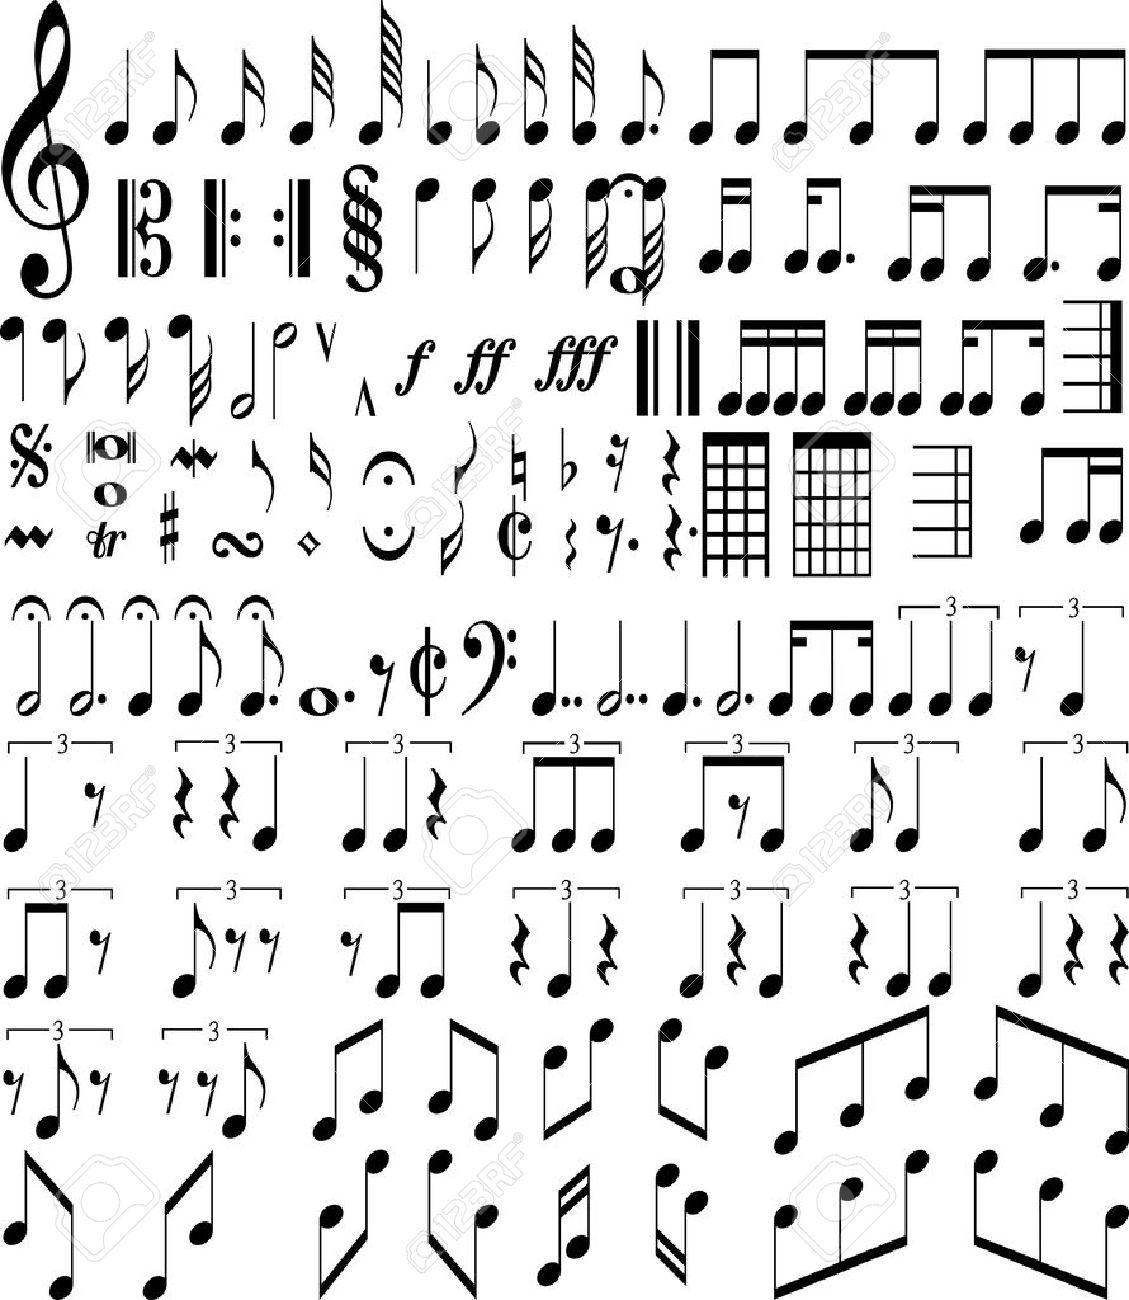 Music symbols royalty free cliparts vectors and stock music symbols stock vector 18779948 buycottarizona